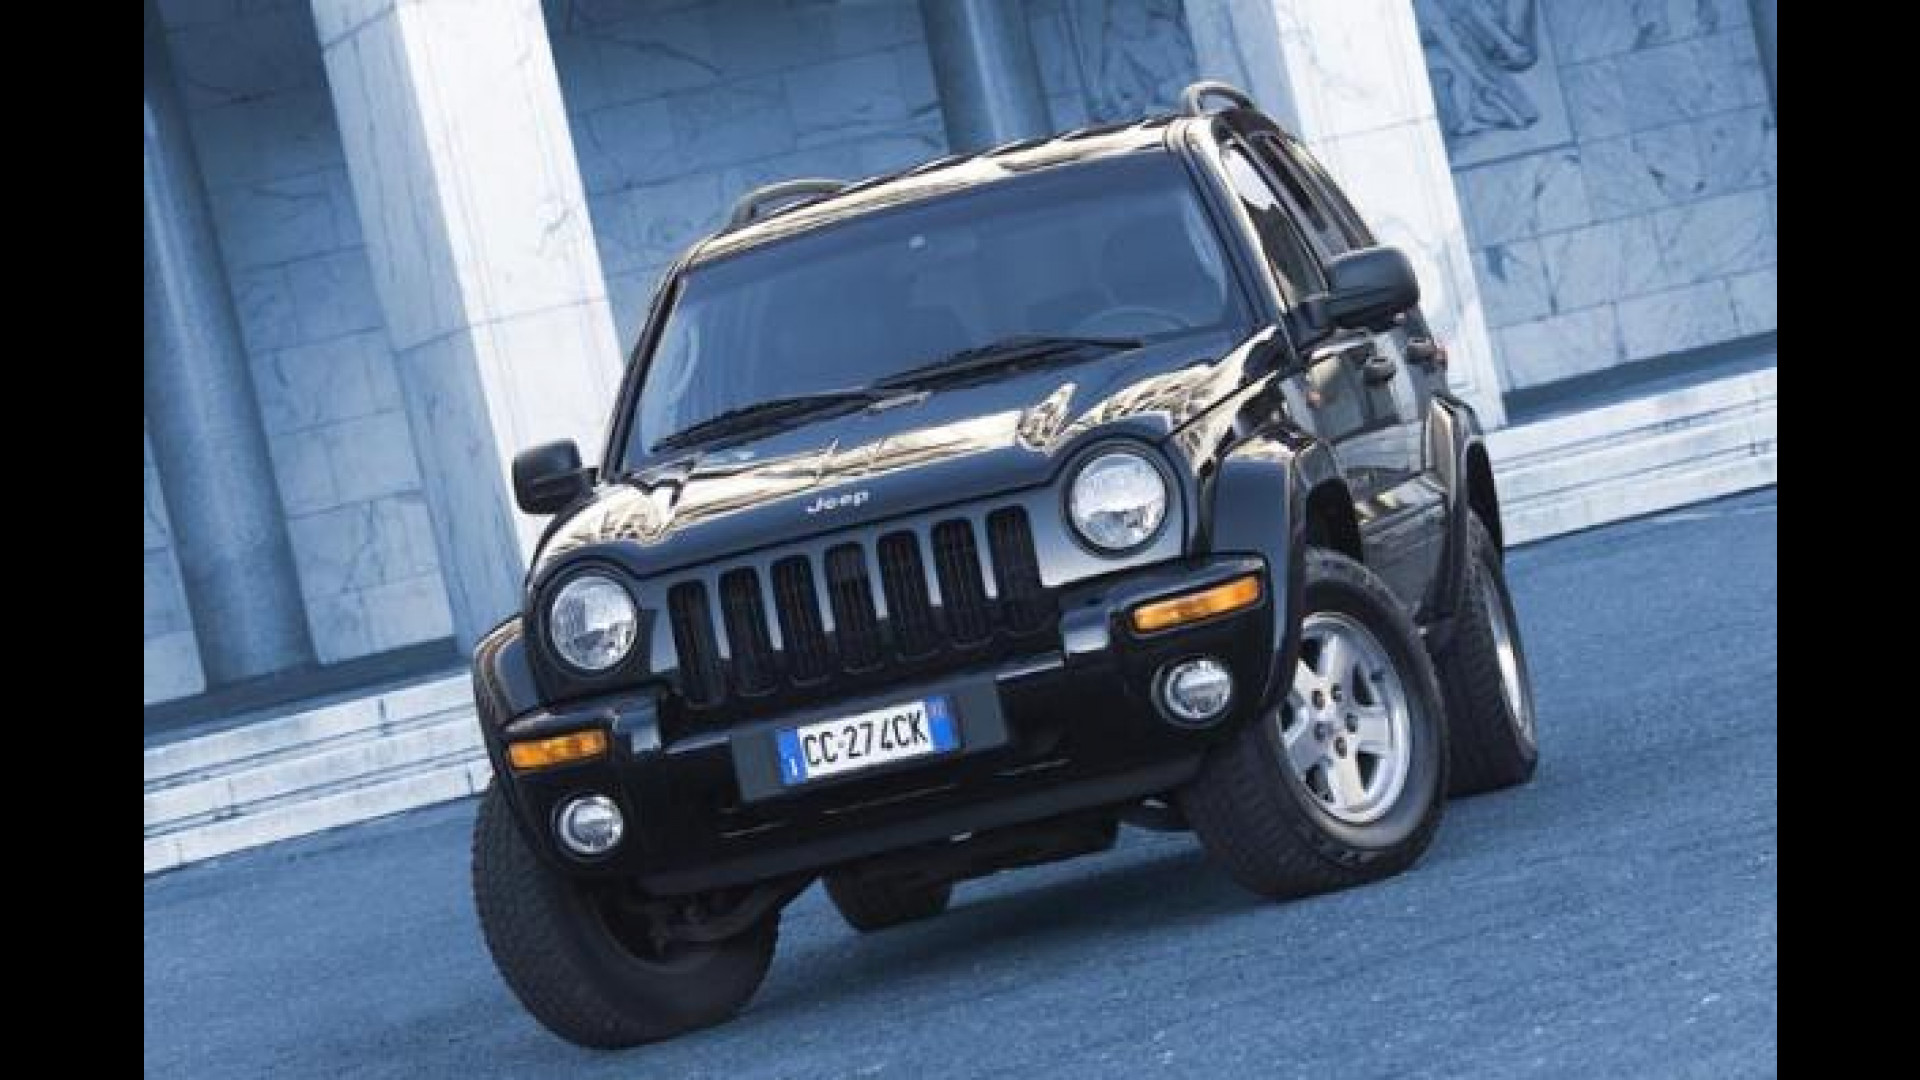 Schema Elettrico Jeep Cherokee Kj : Silentblock jeep cherokee u e english officine landi